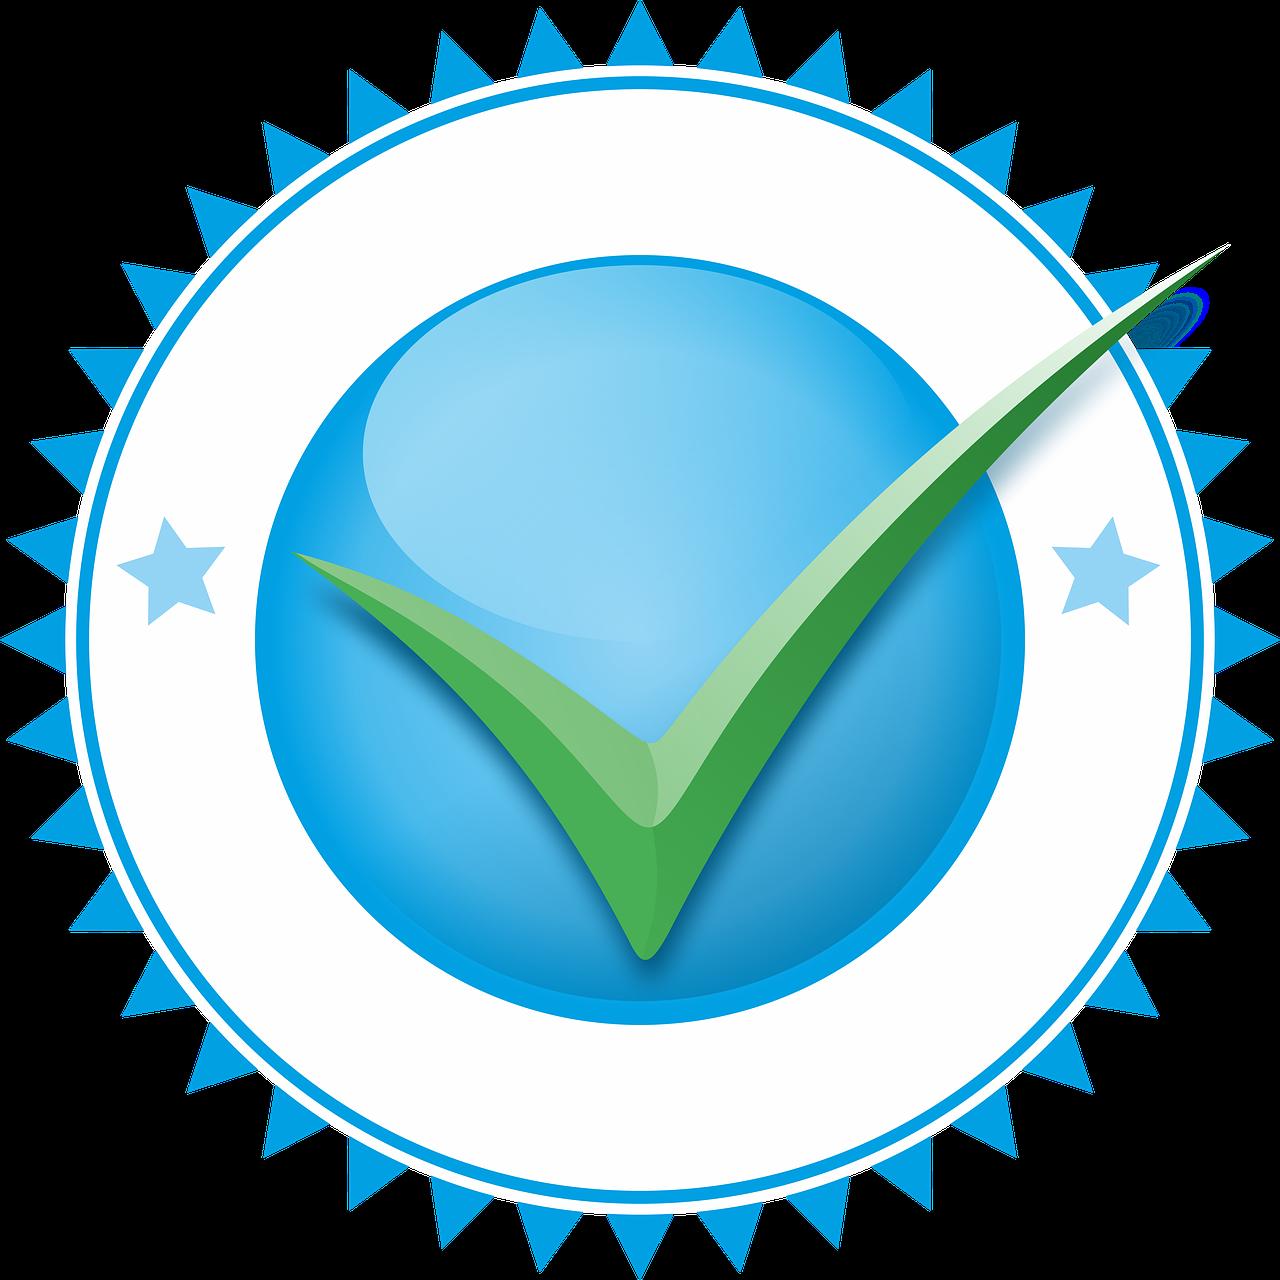 validation-1614001_1280.png